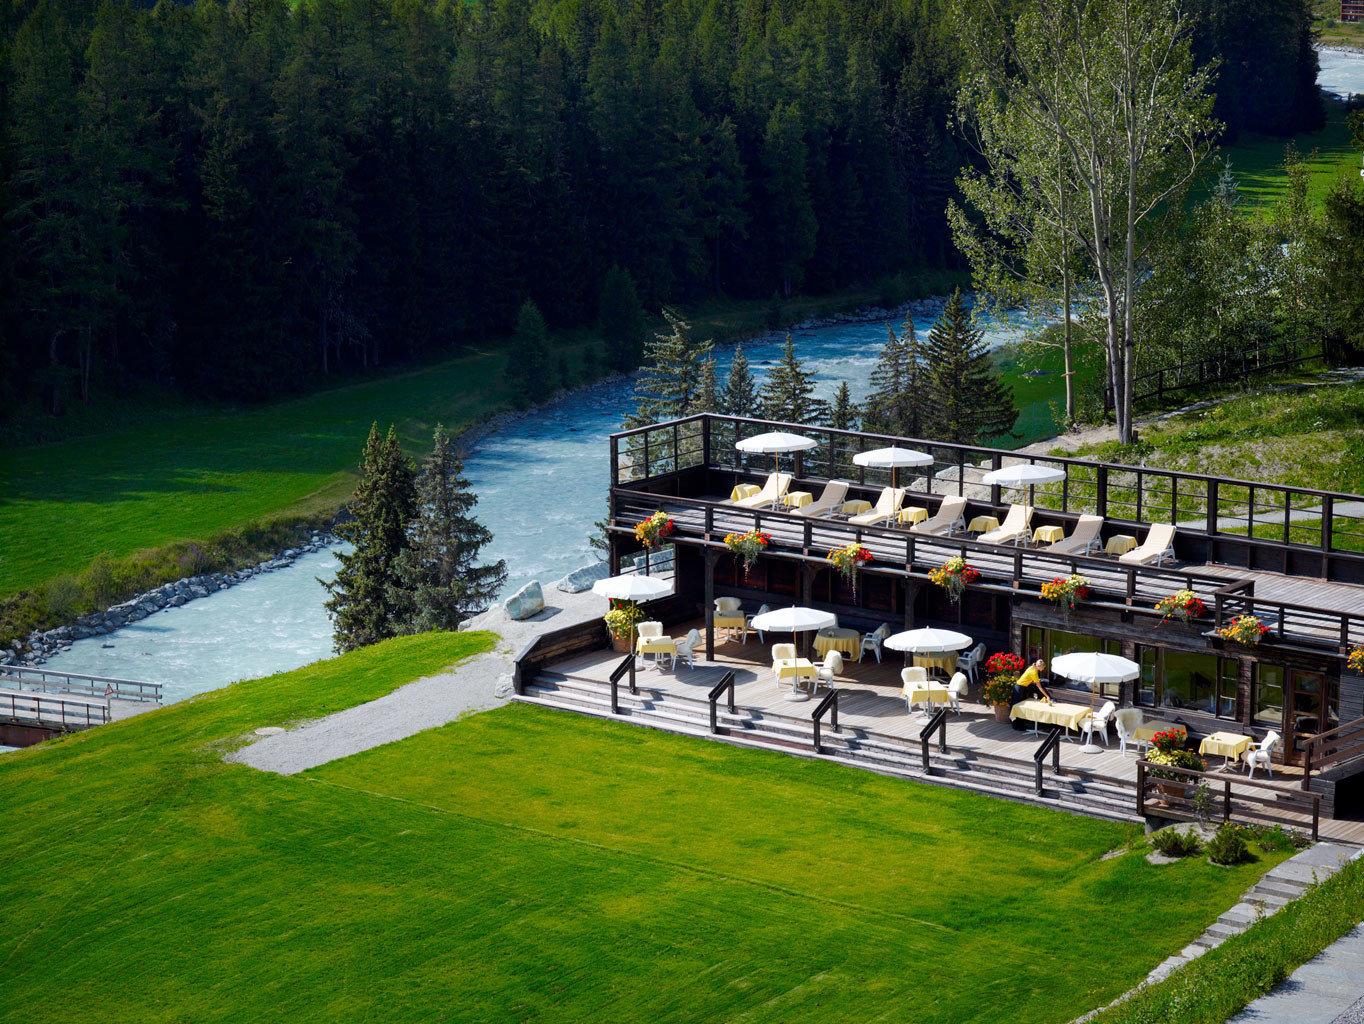 Courtyard Deck Dining Drink Garden Waterfront grass tree park aerial photography waterway lush